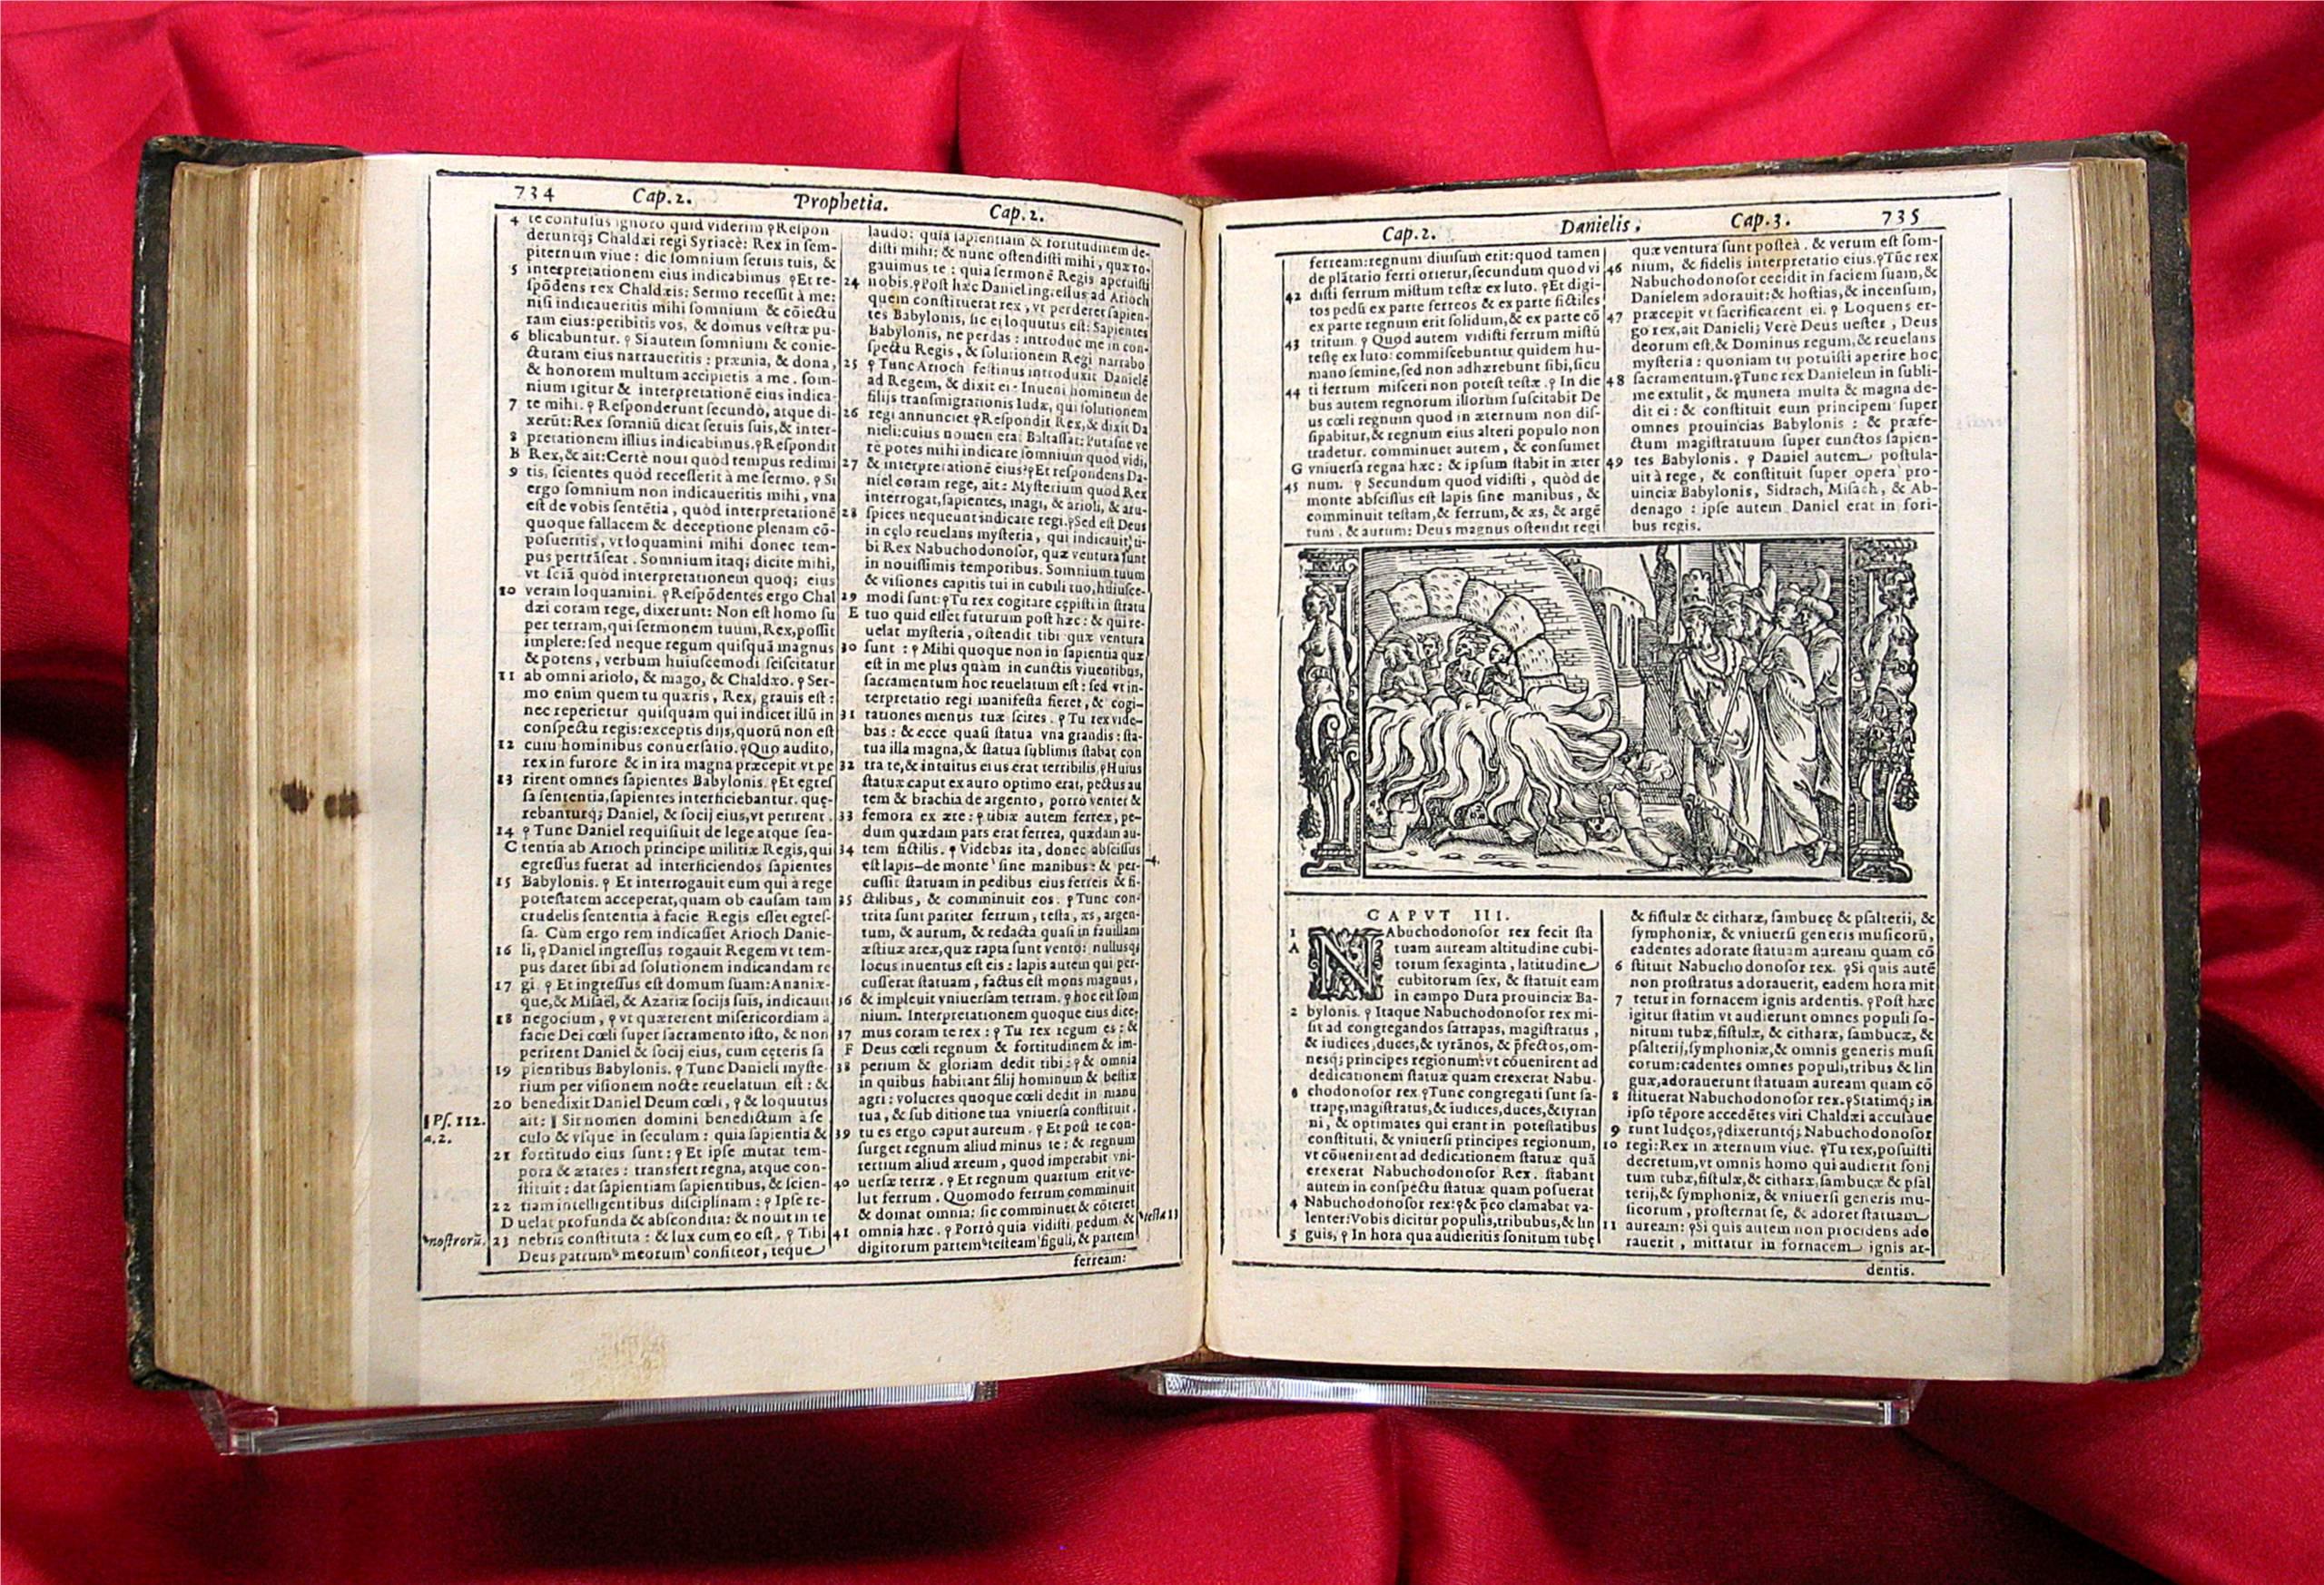 Sainte Bible traduite du latin vulgate